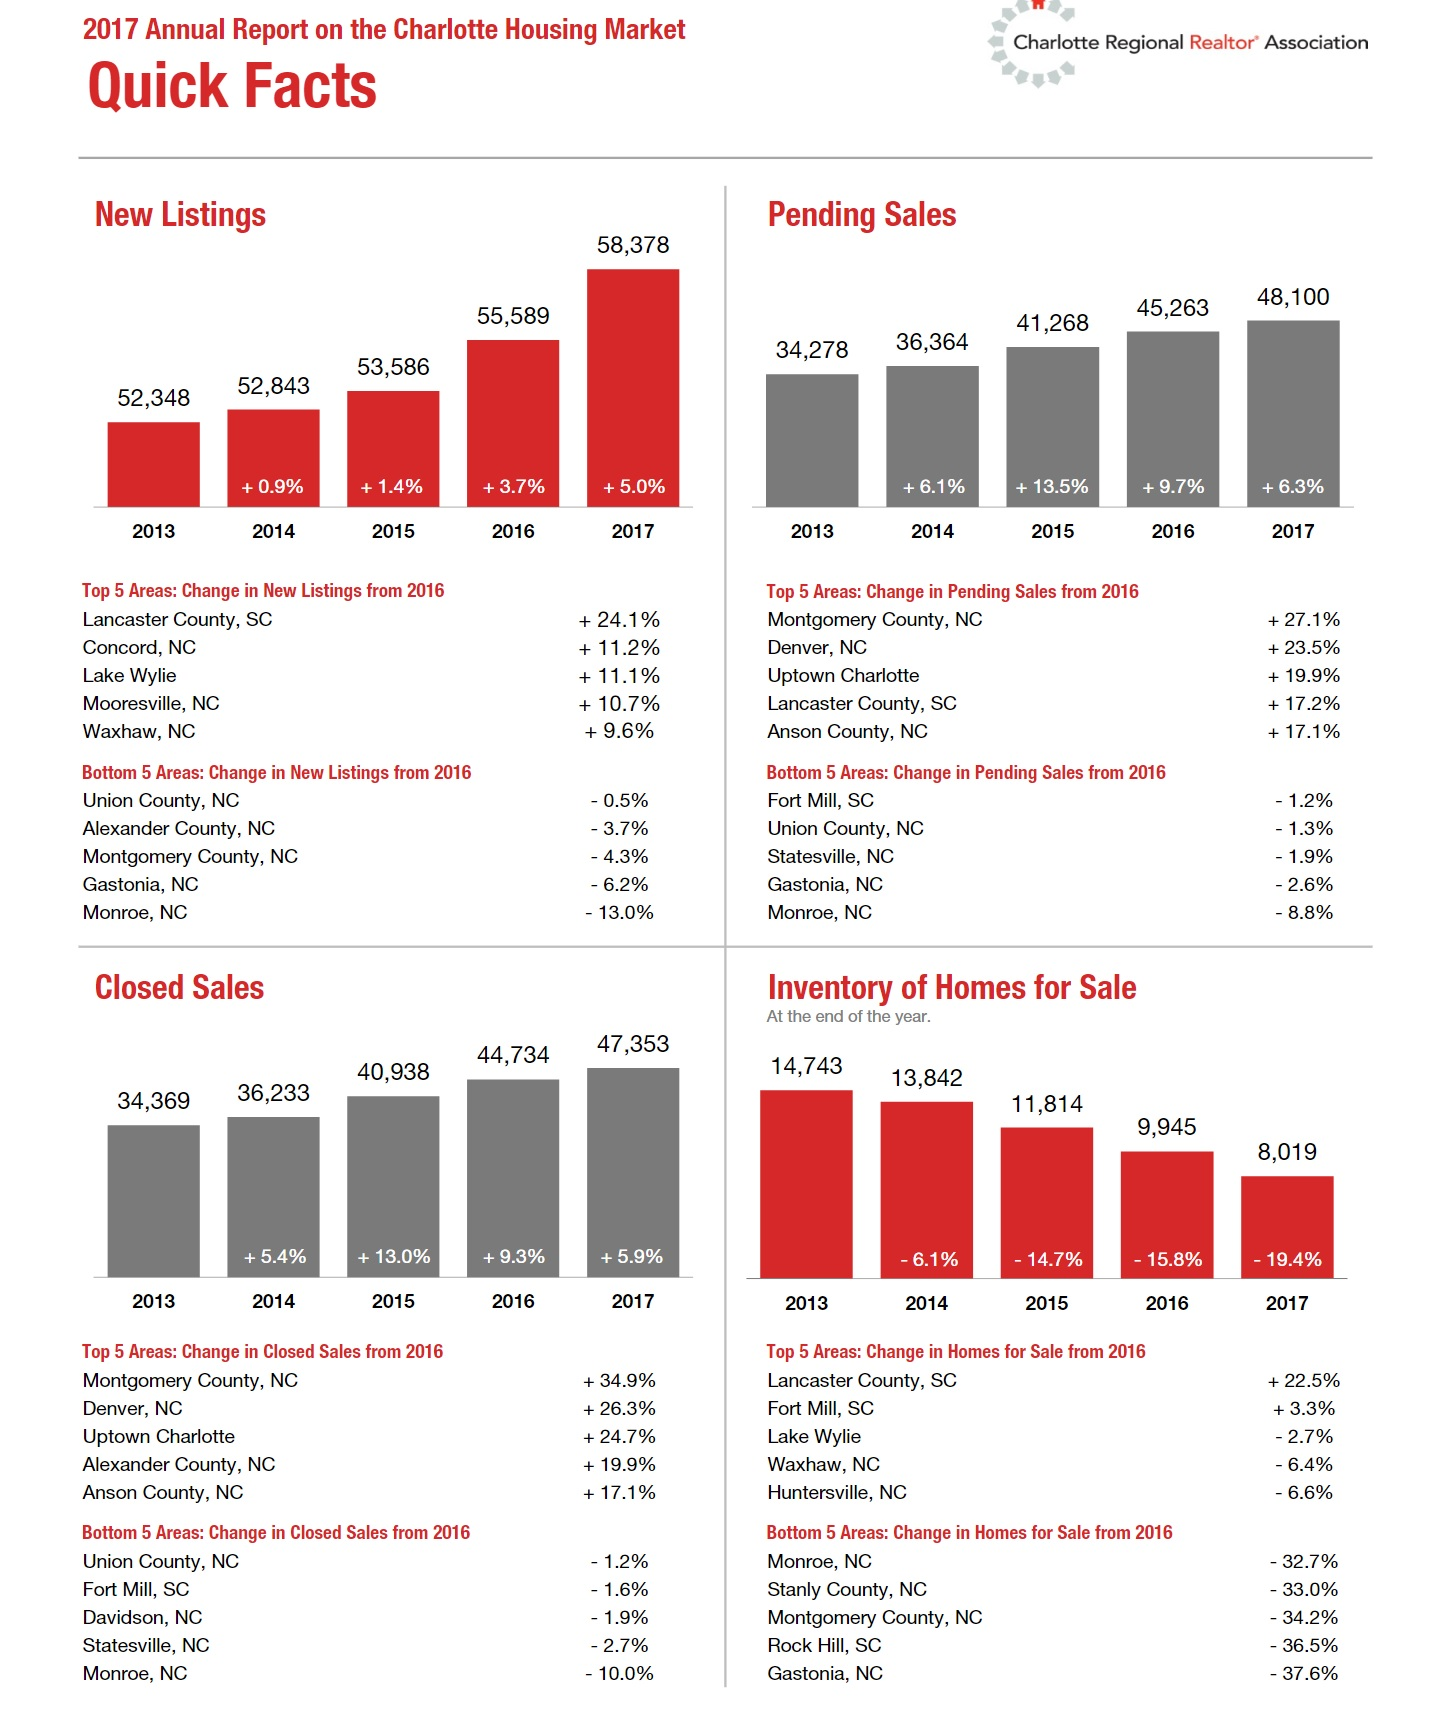 2017 Charlotte Housing Market Quick Facts